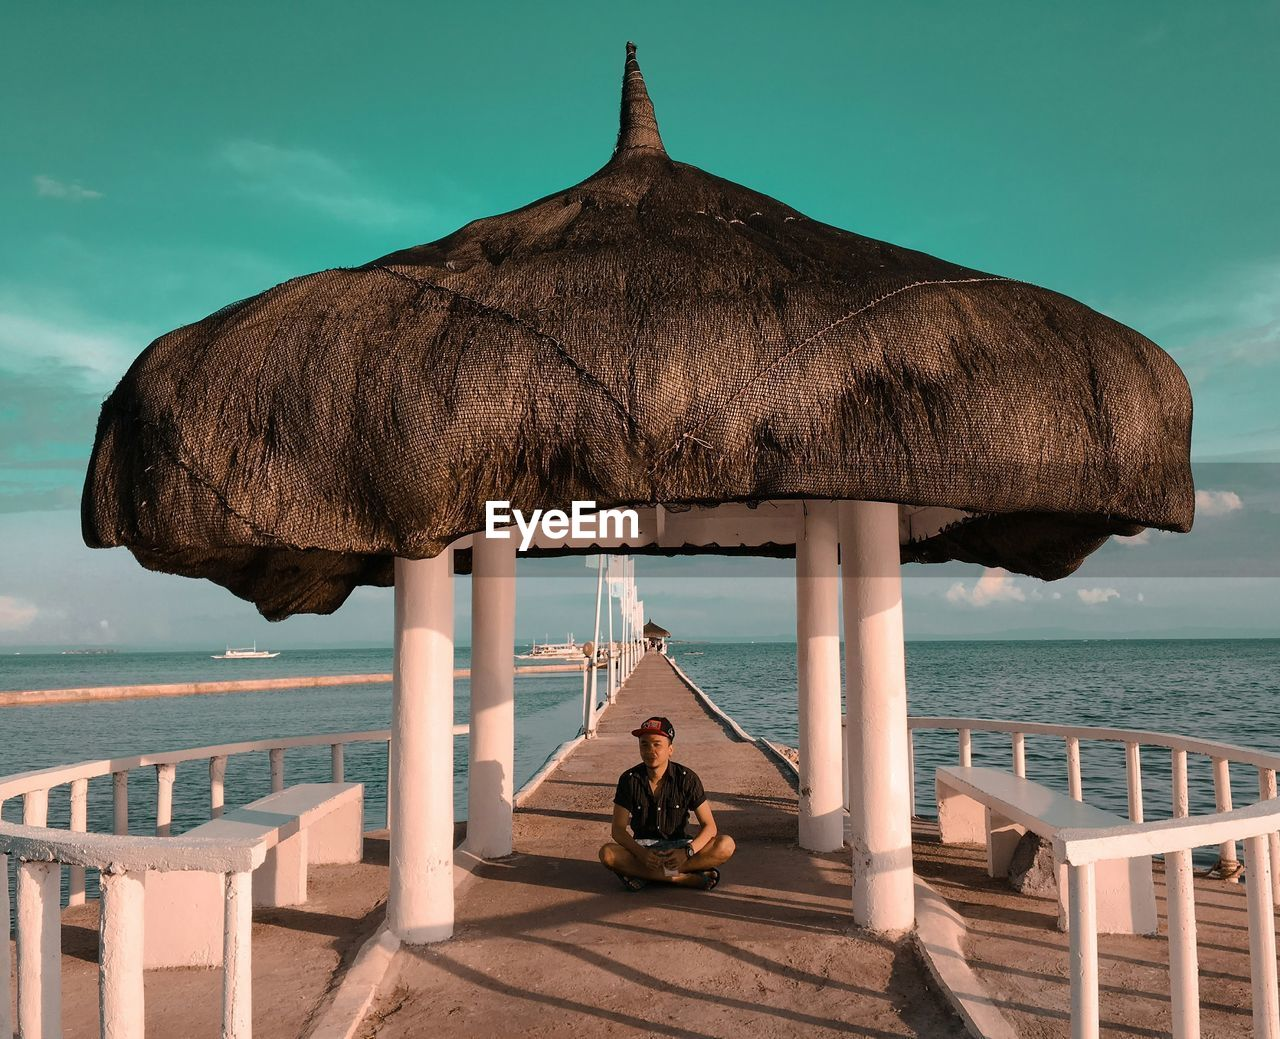 Man sitting below gazebo on pier against turquoise sky